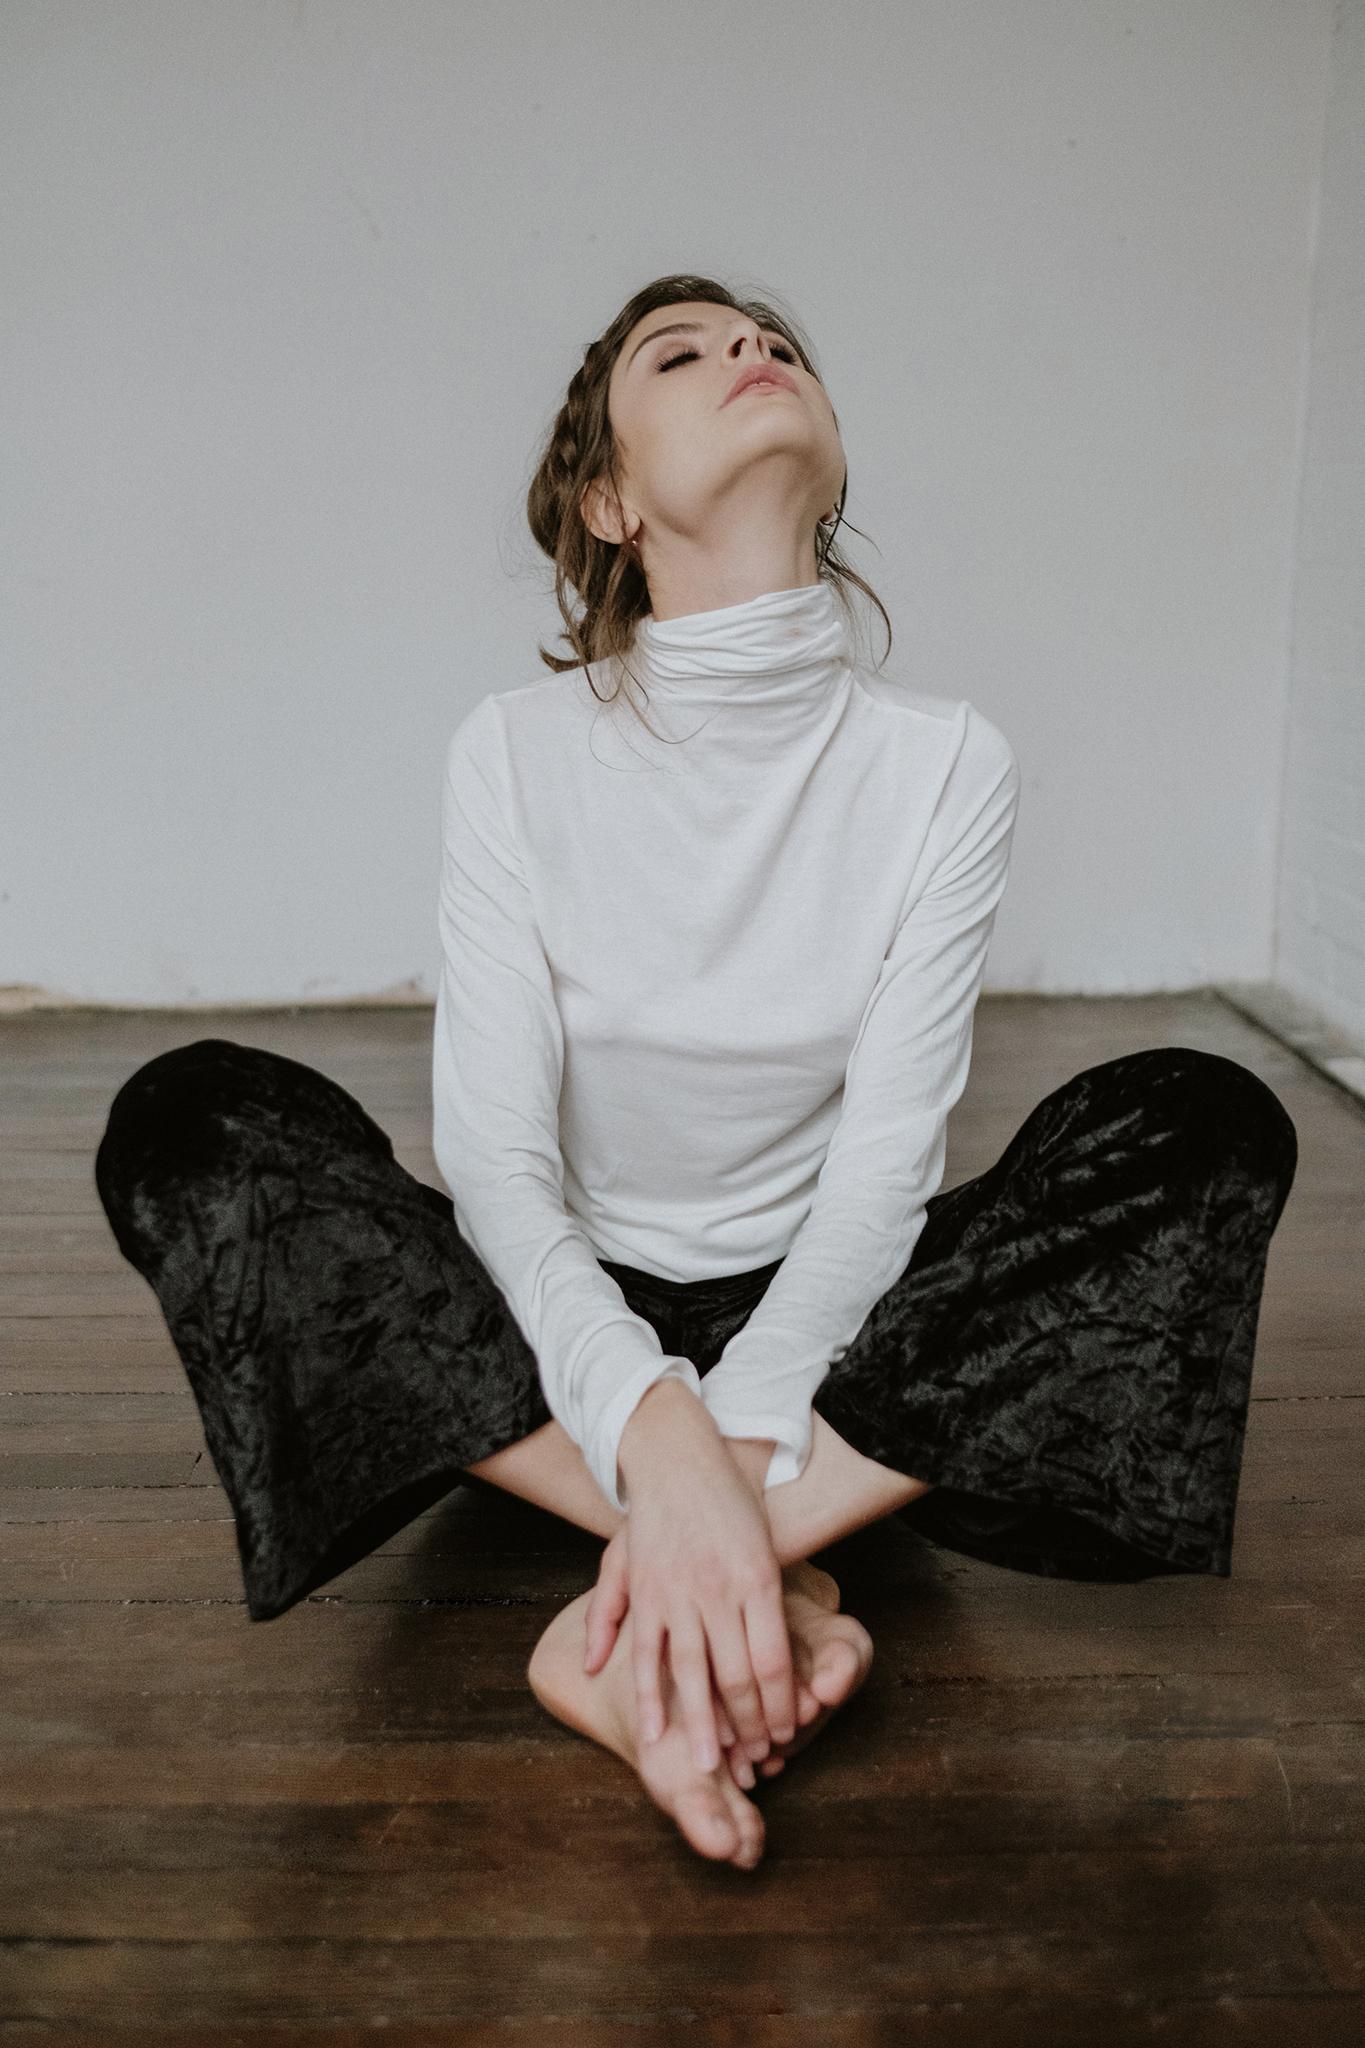 model-sitting-on-floor-cross-legged-looking-up